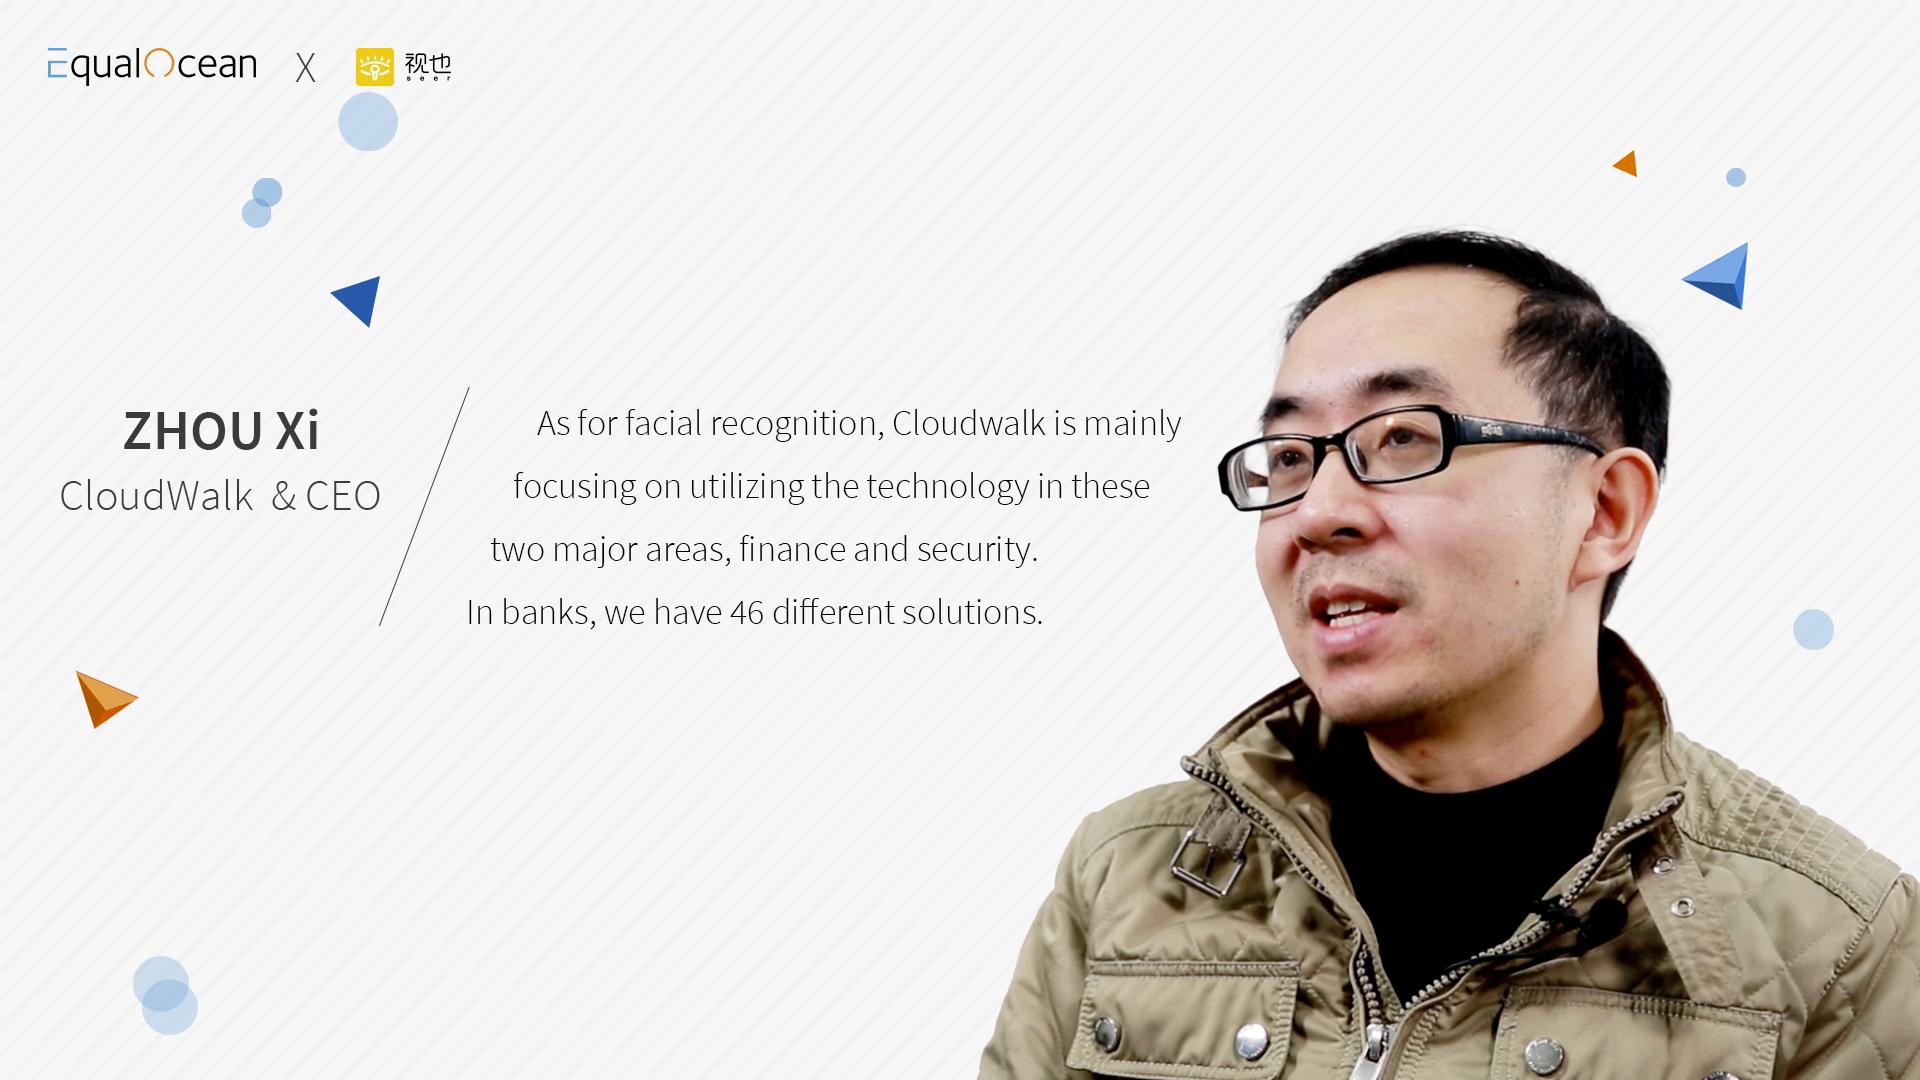 We Define AI - CloudWalk CEO, ZHOU Xi